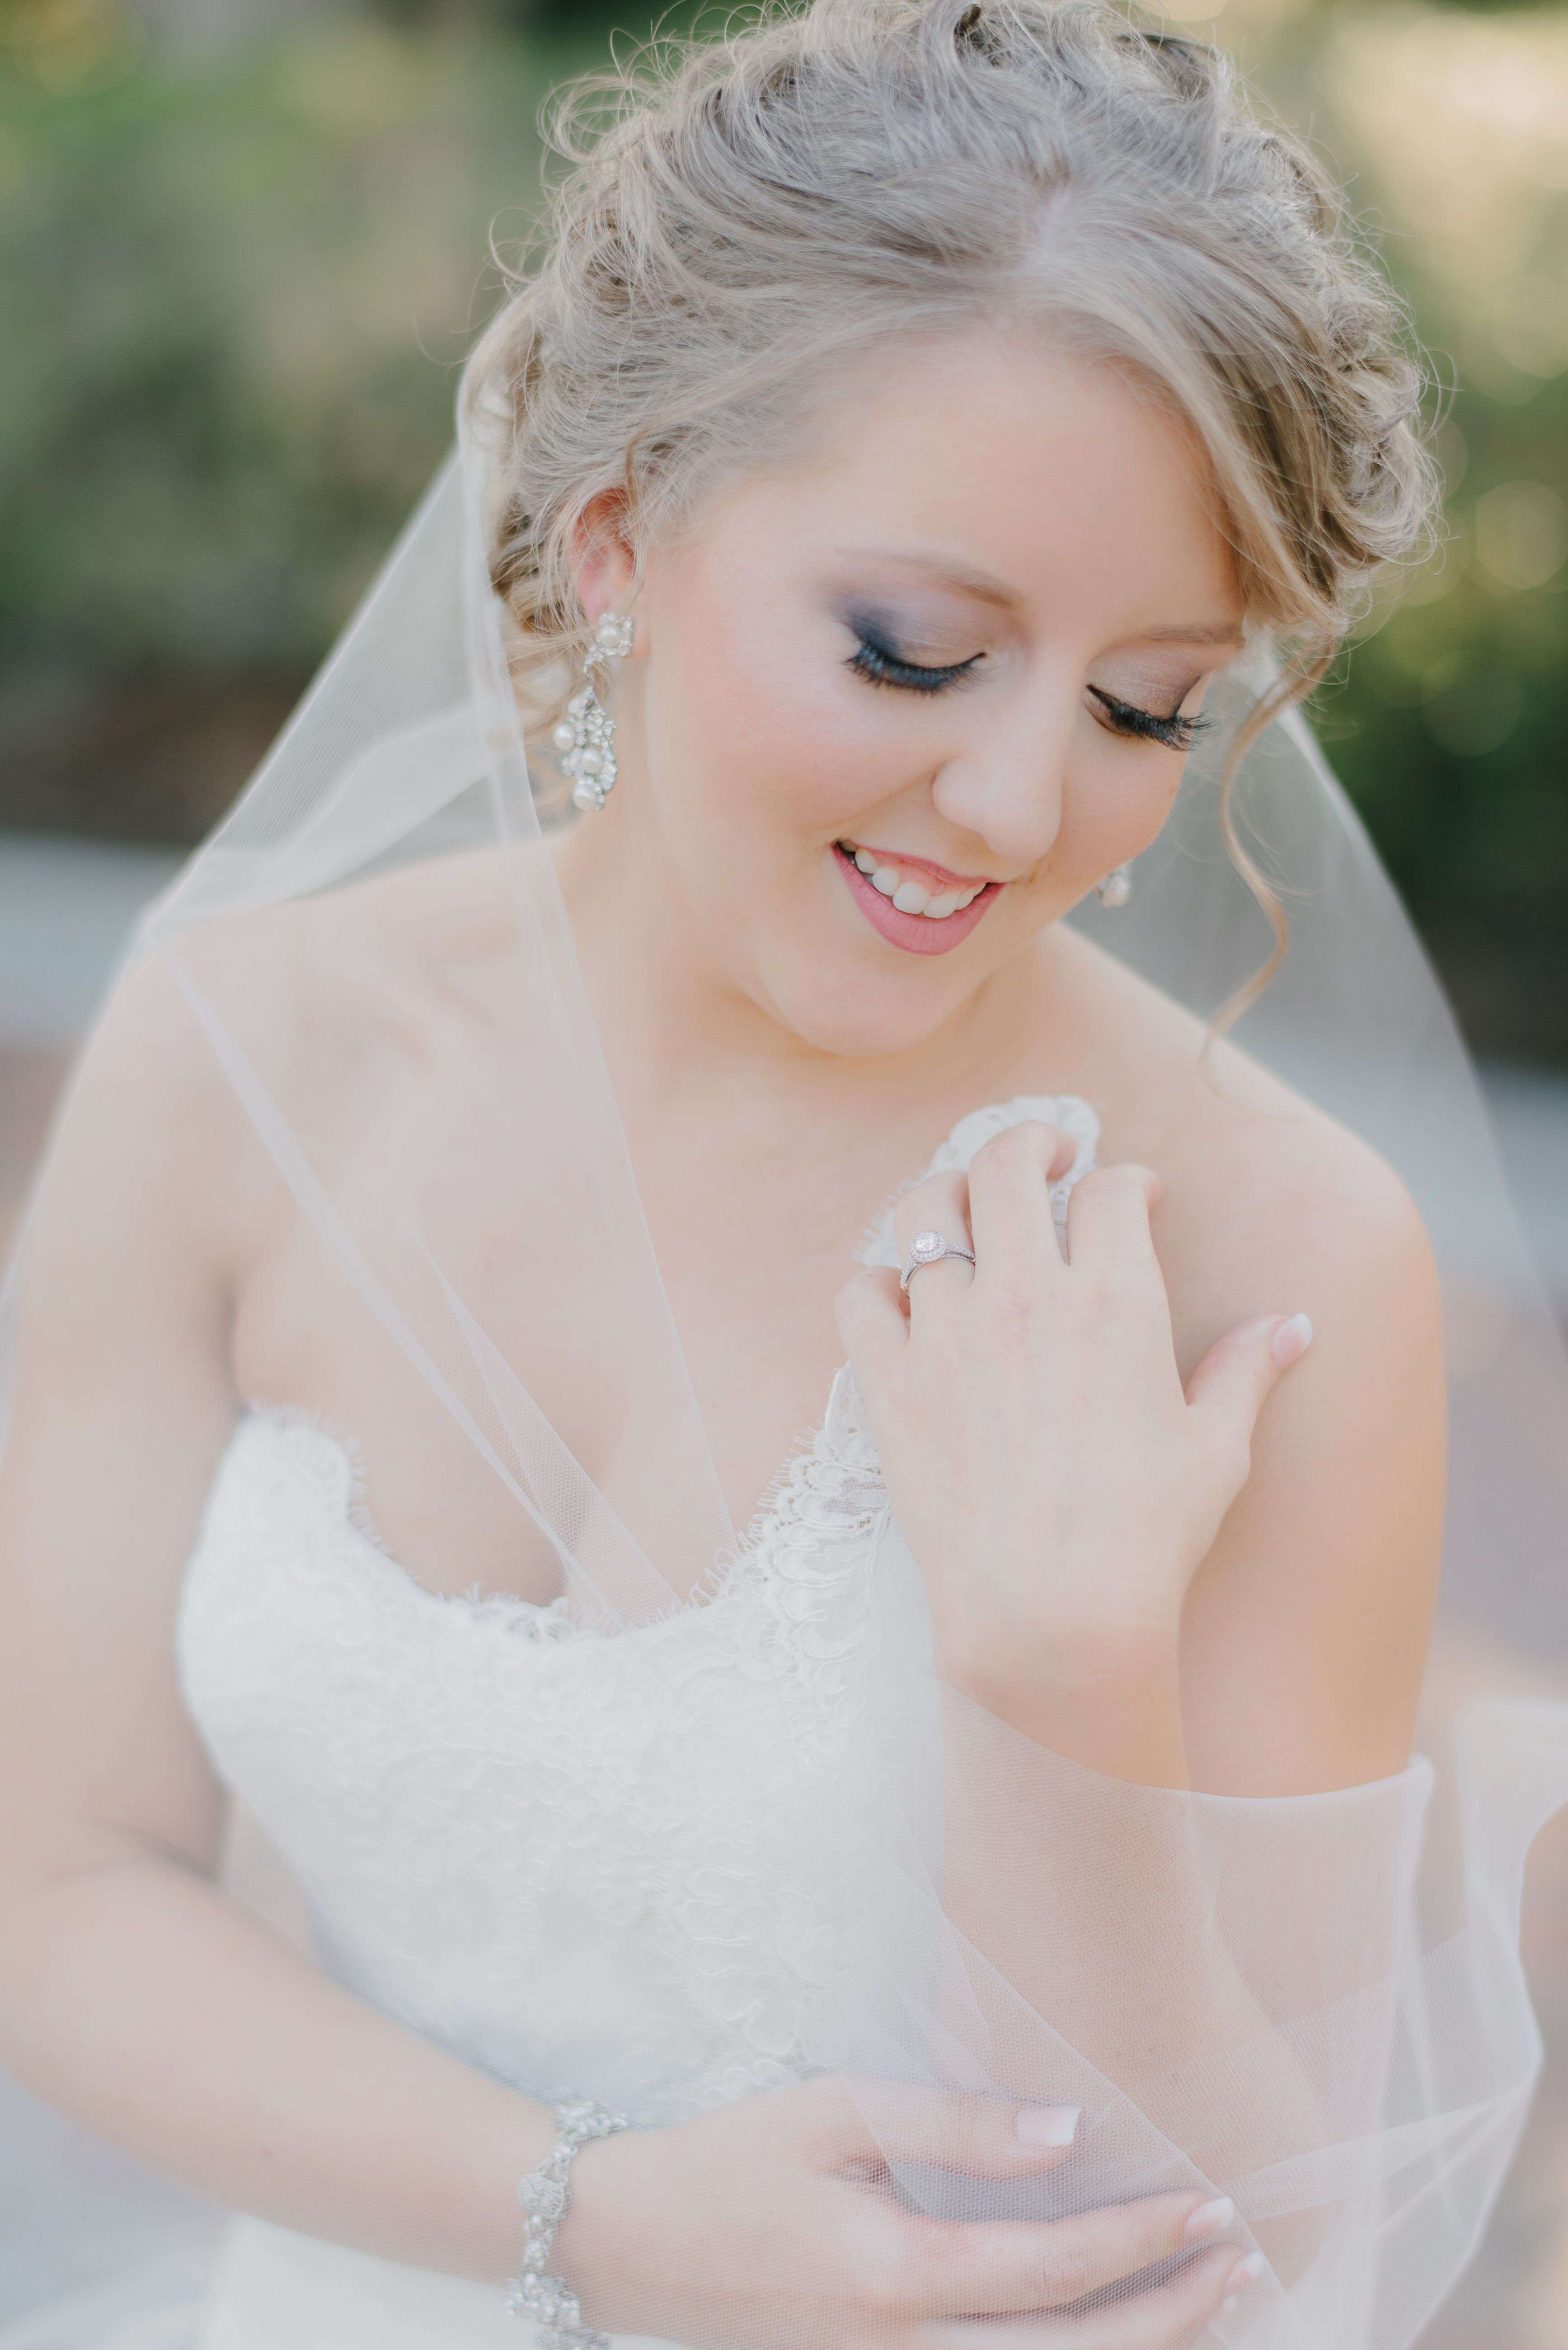 Real bride in bliss monique lhuillier wedding dress from solutions real bride in bliss monique lhuillier wedding dress from solutions bridal in orlando florida fit ombrellifo Choice Image